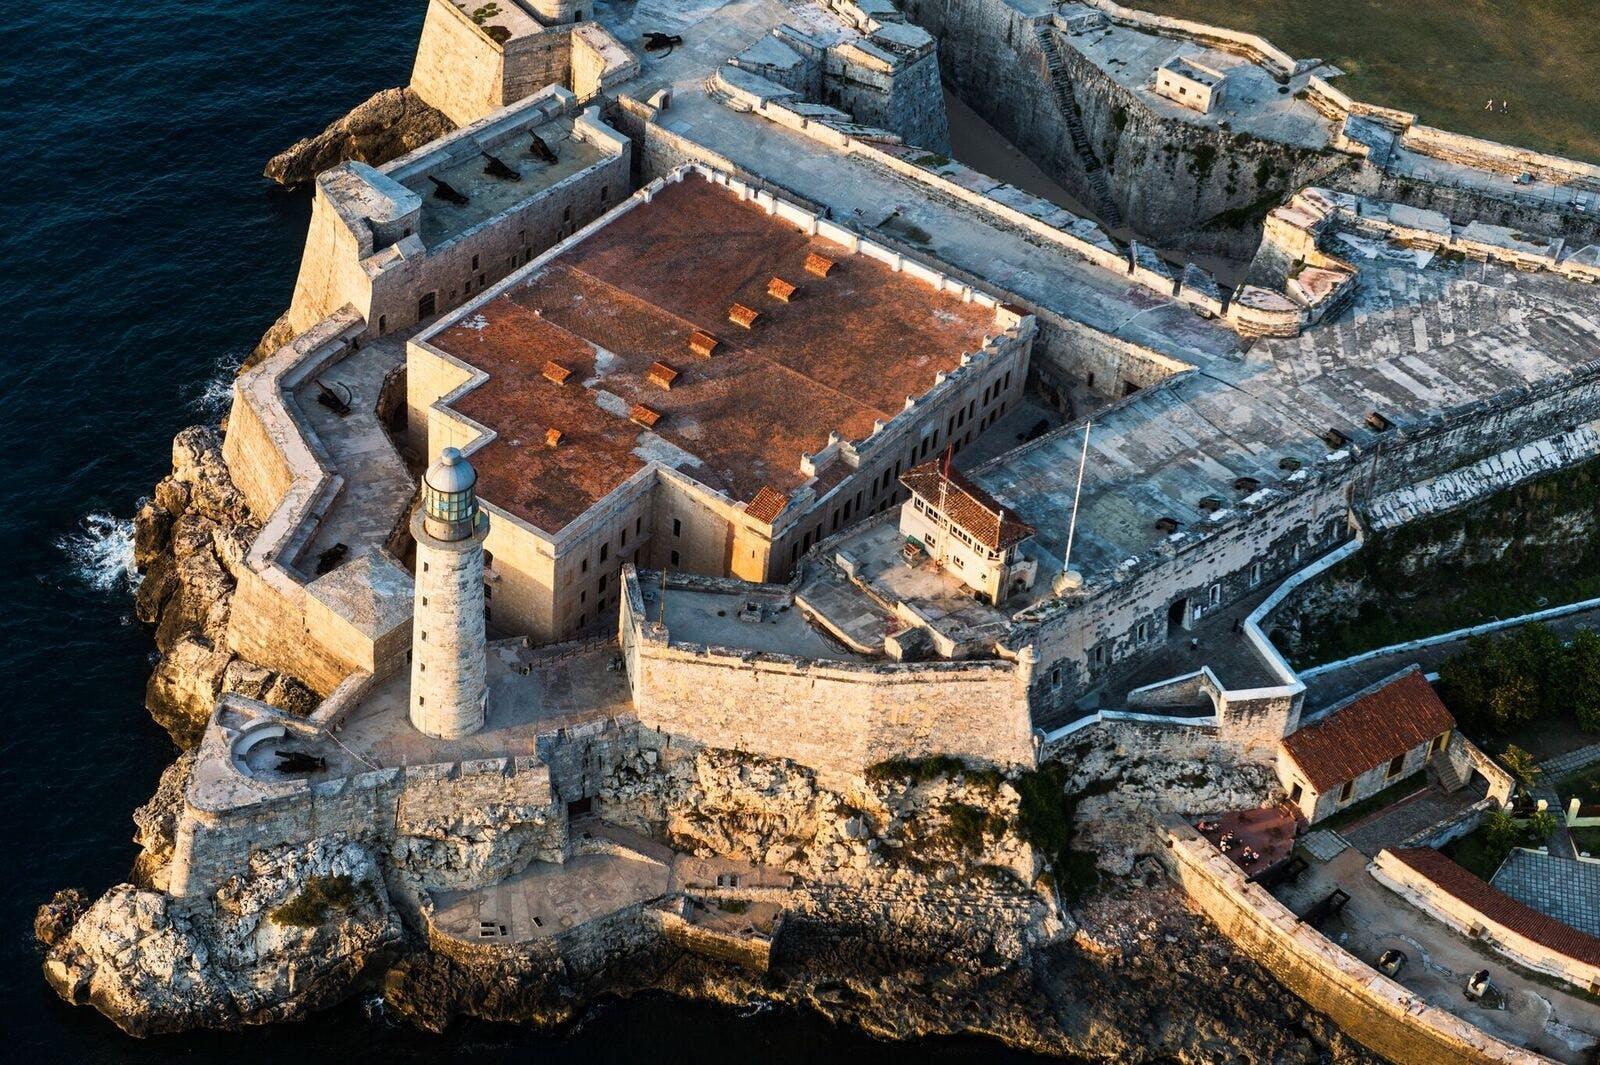 Aerial view of El Morro, Havana's Castle fortress